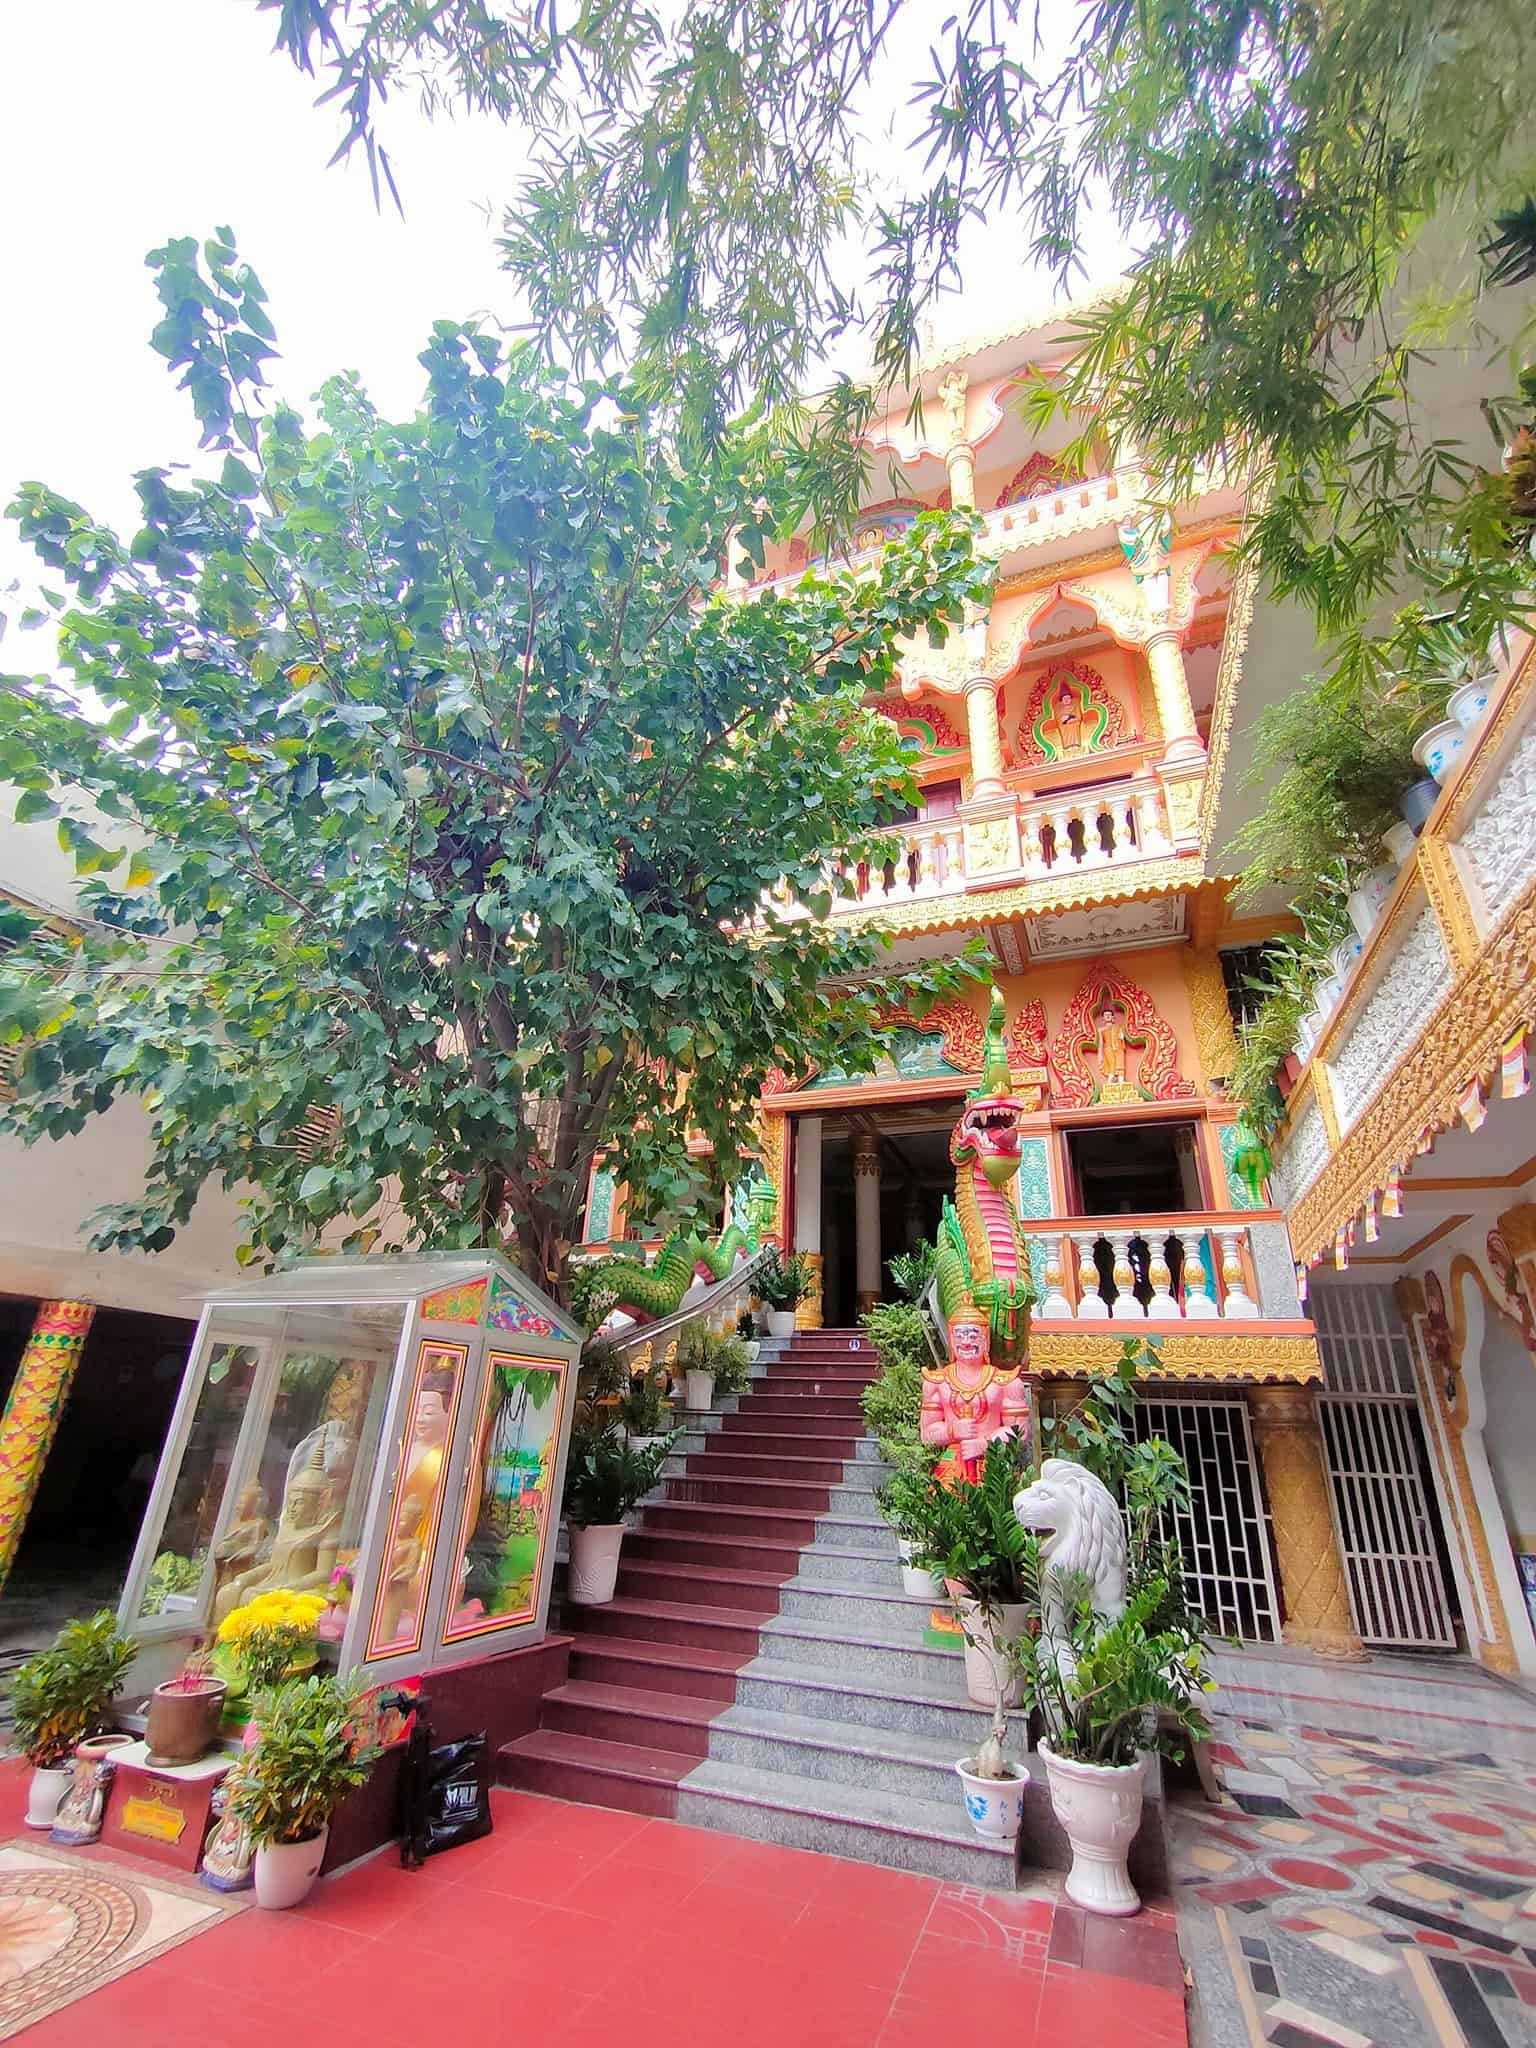 Pitu Khosa Rangsay Pagoda History